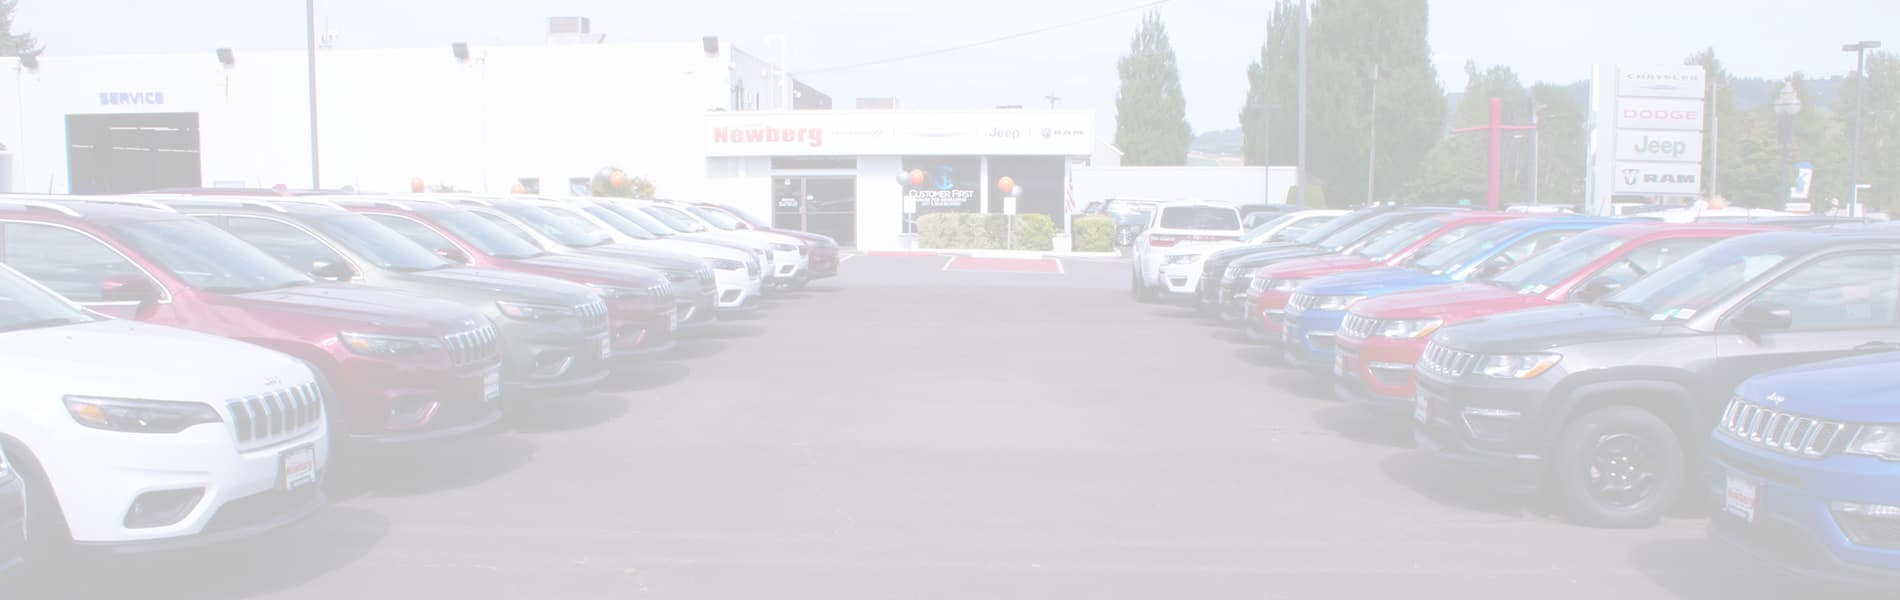 Newberg Dodge Jeep Ram Chrysler | Family Run Dealership in